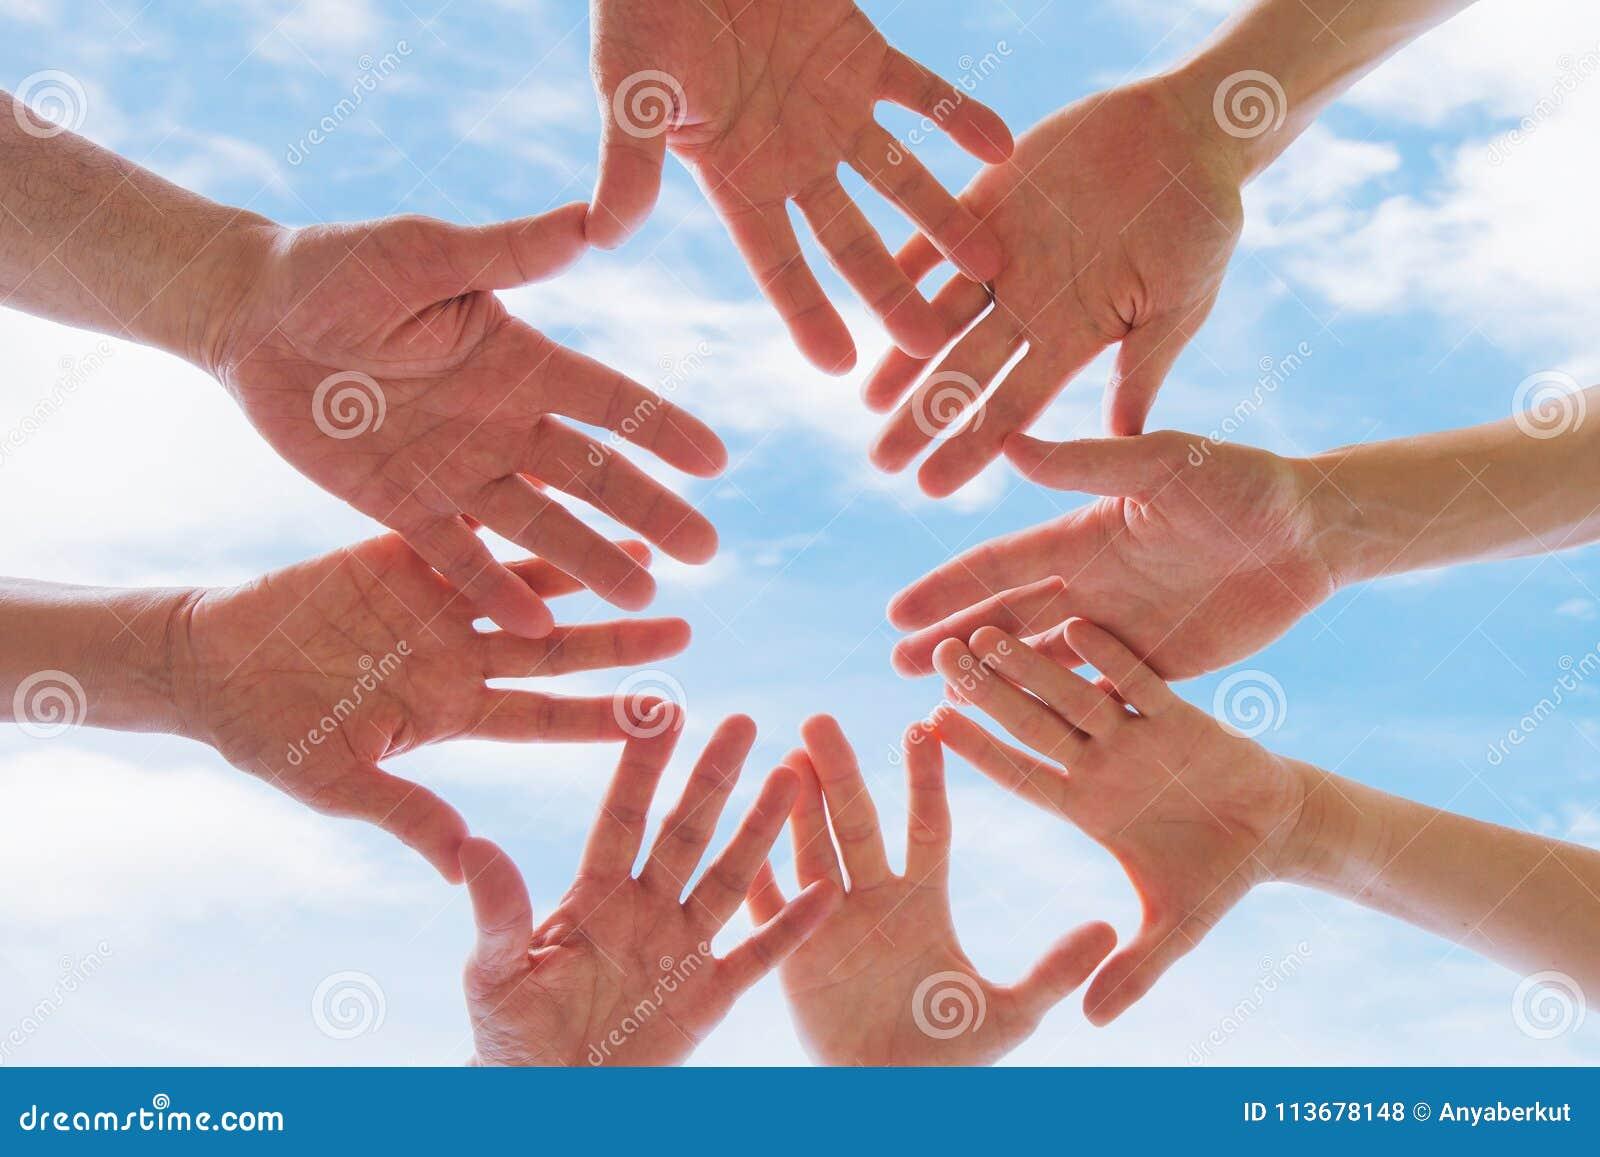 Team of broederschapconcept, groep mensen die handen samenbrengen